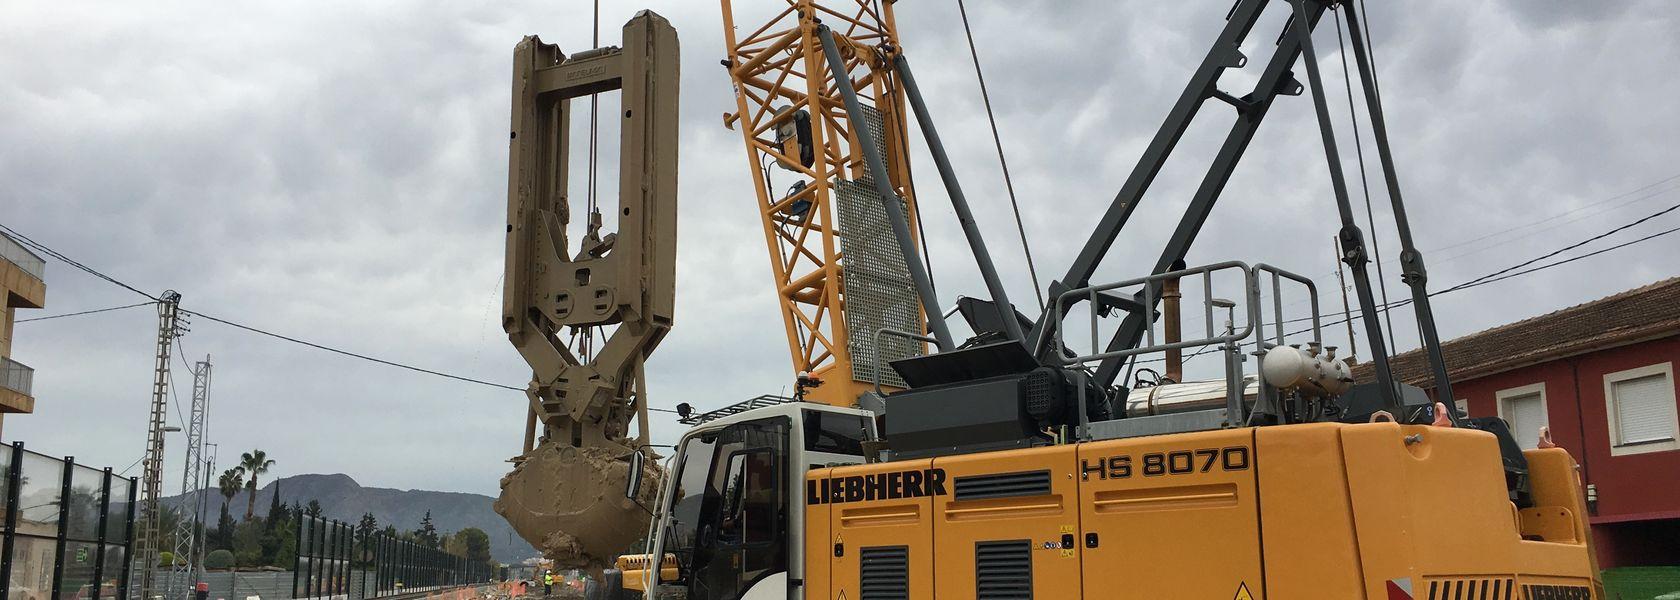 Five generations of Liebherr HS crawler cranes at work in Murcia